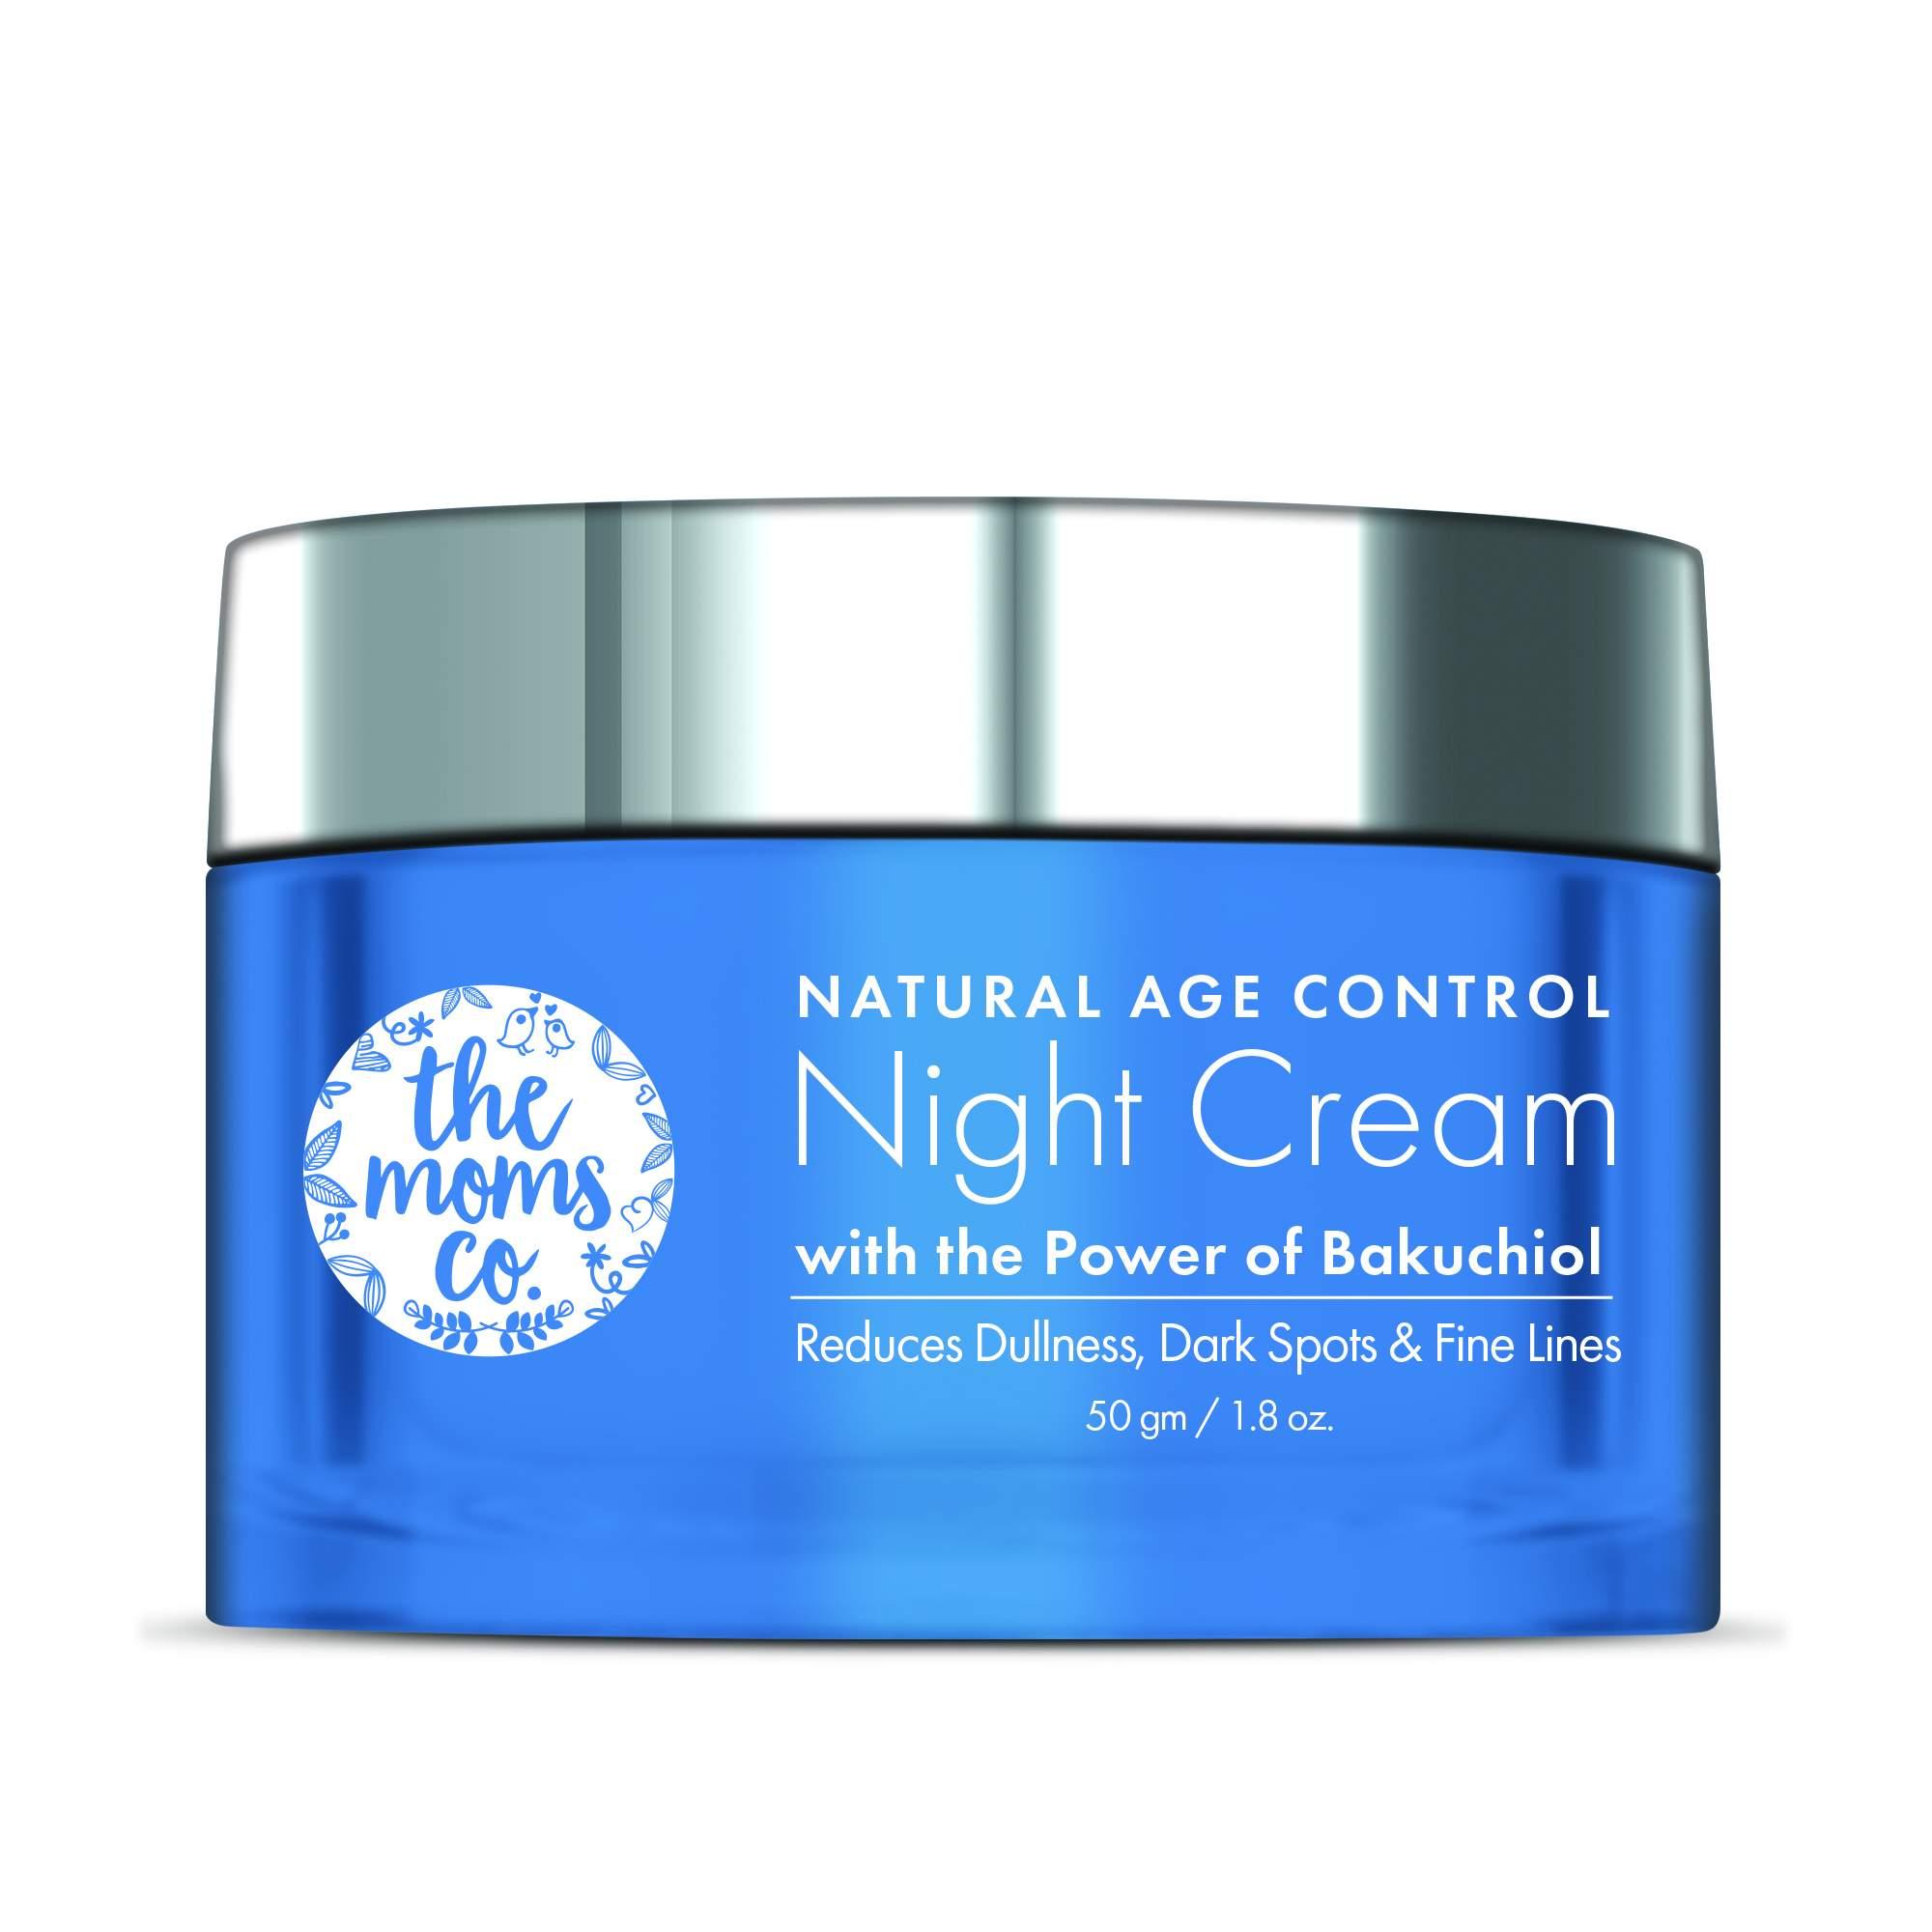 The Moms Co. Night Cream